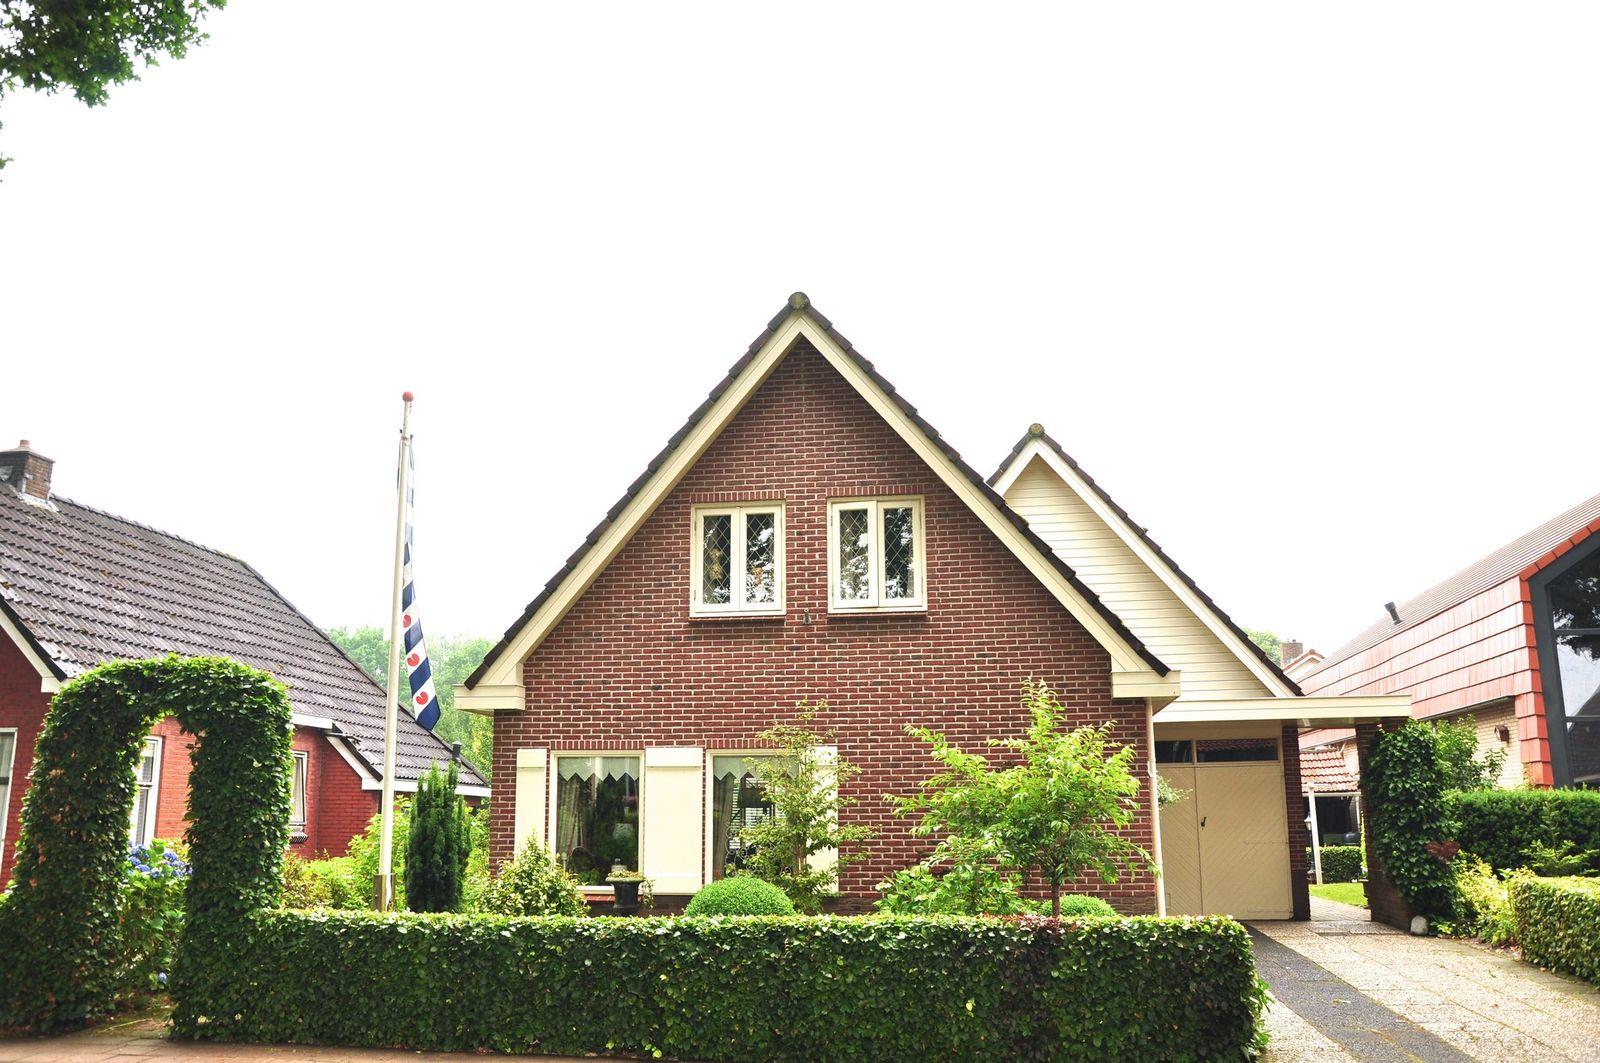 Eikensingel 20, Haulerwijk